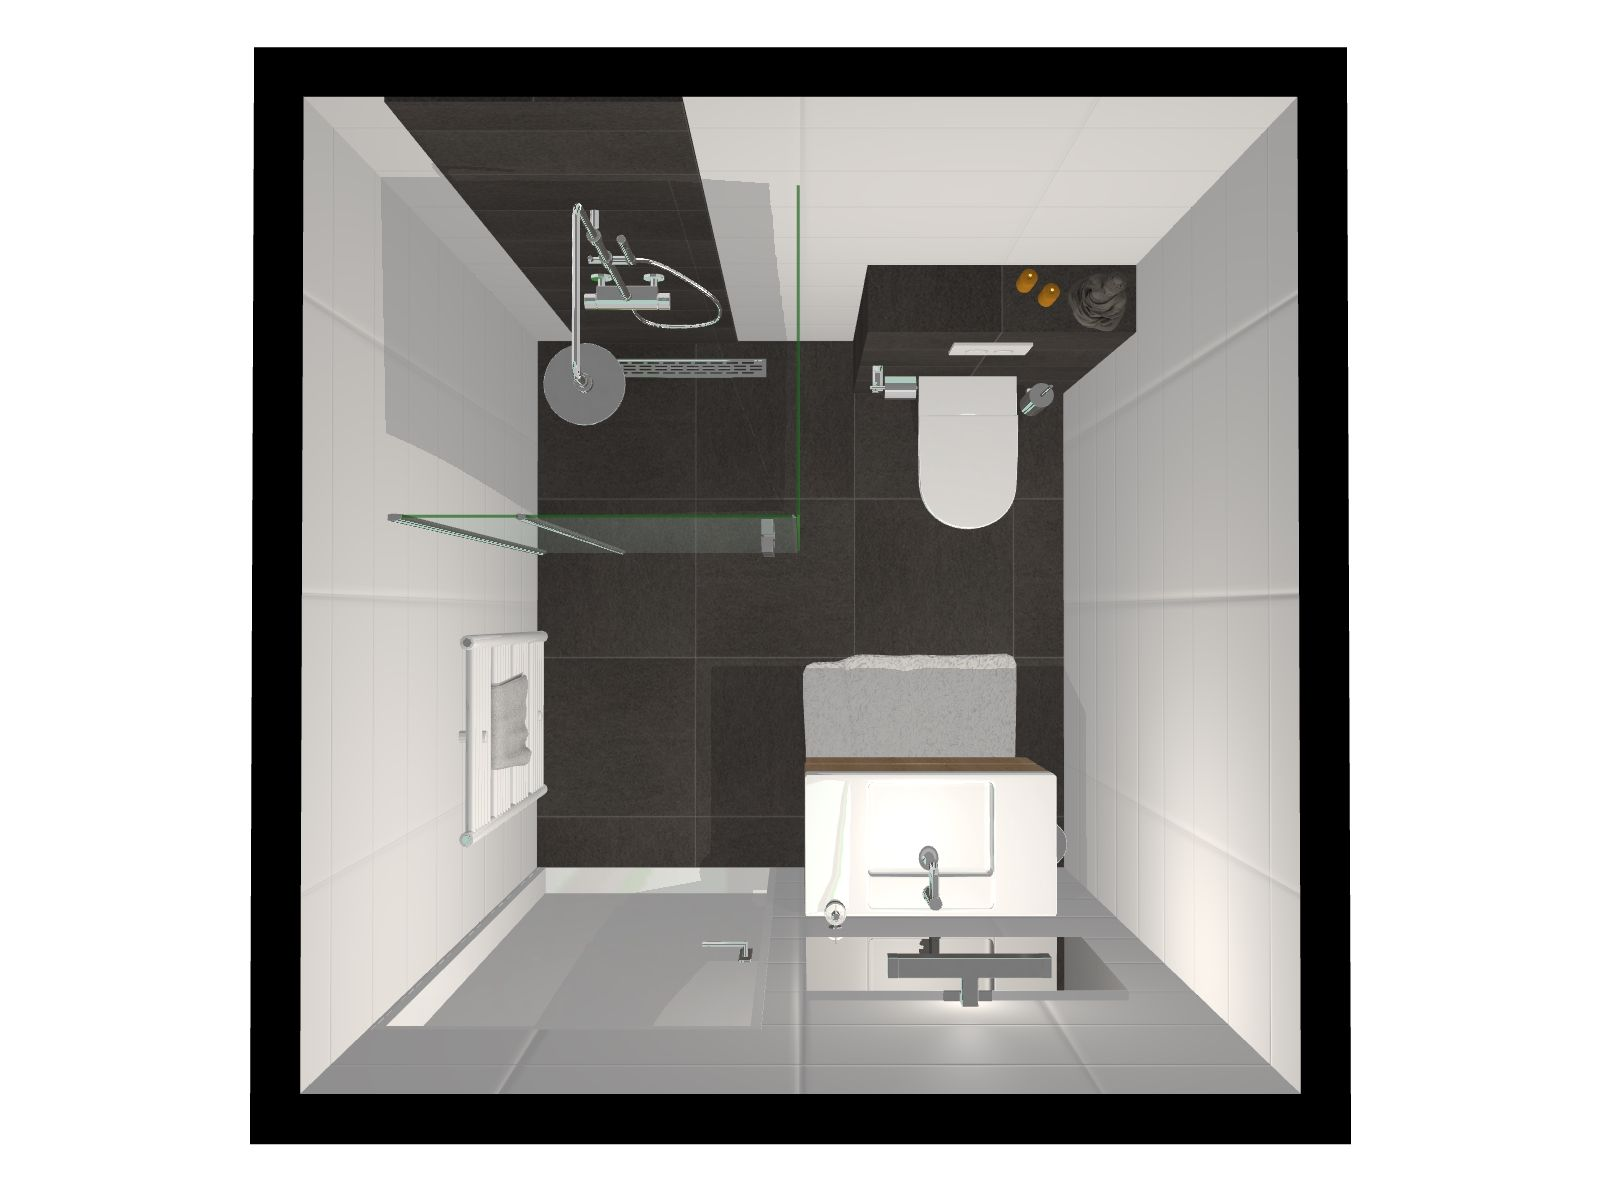 keuken / sani sale - roweco bouw, Badkamer